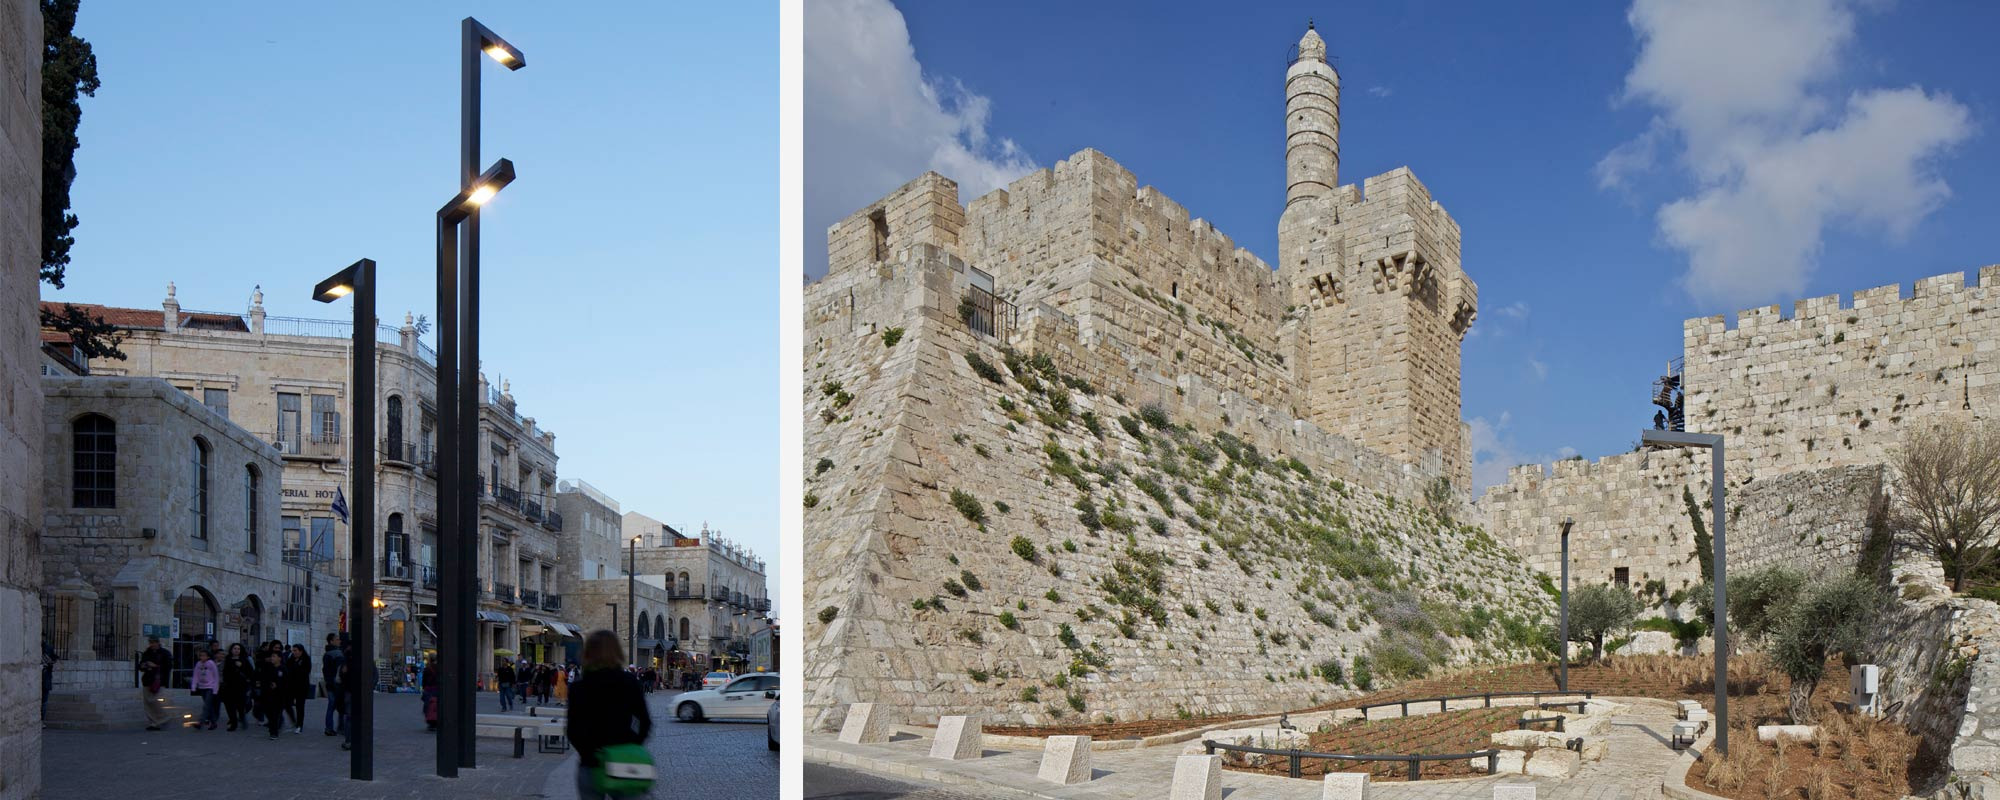 D_Jerusalem_Jaffa-gate_1